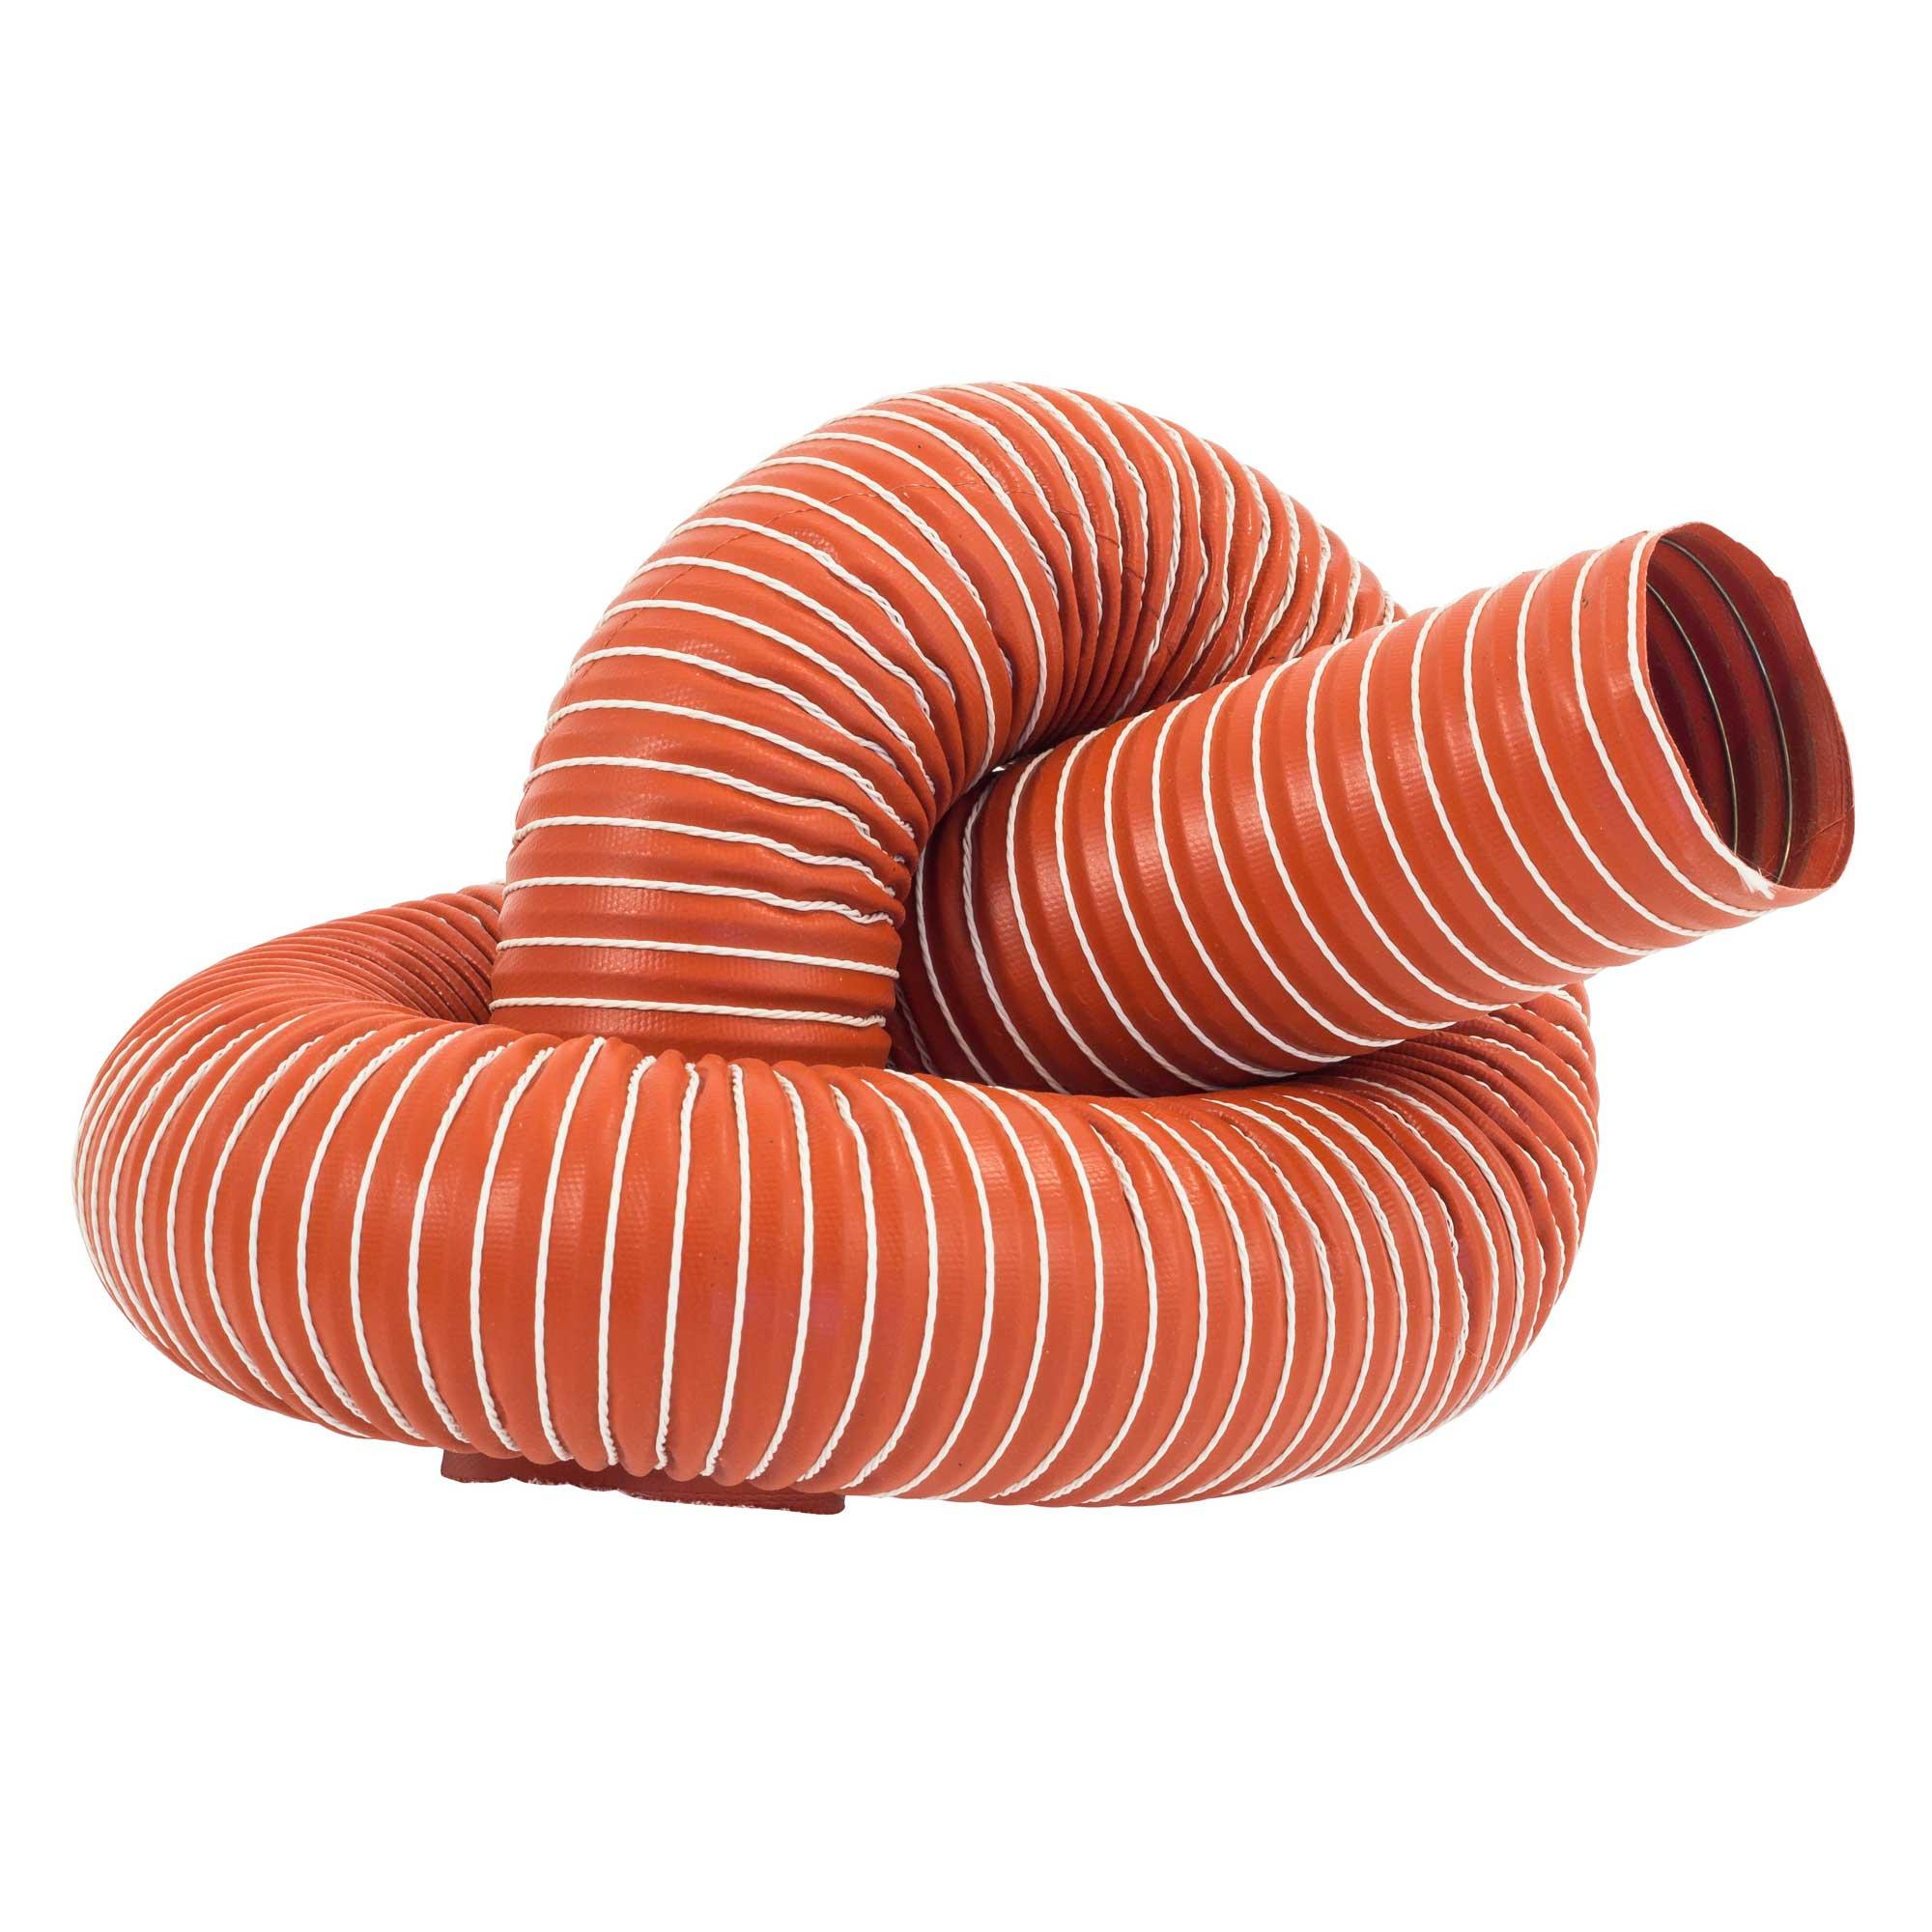 JJC Single Layer Flexible Brake Air Silicone Ducting Hi Temp Hose 57mm Bore 1m